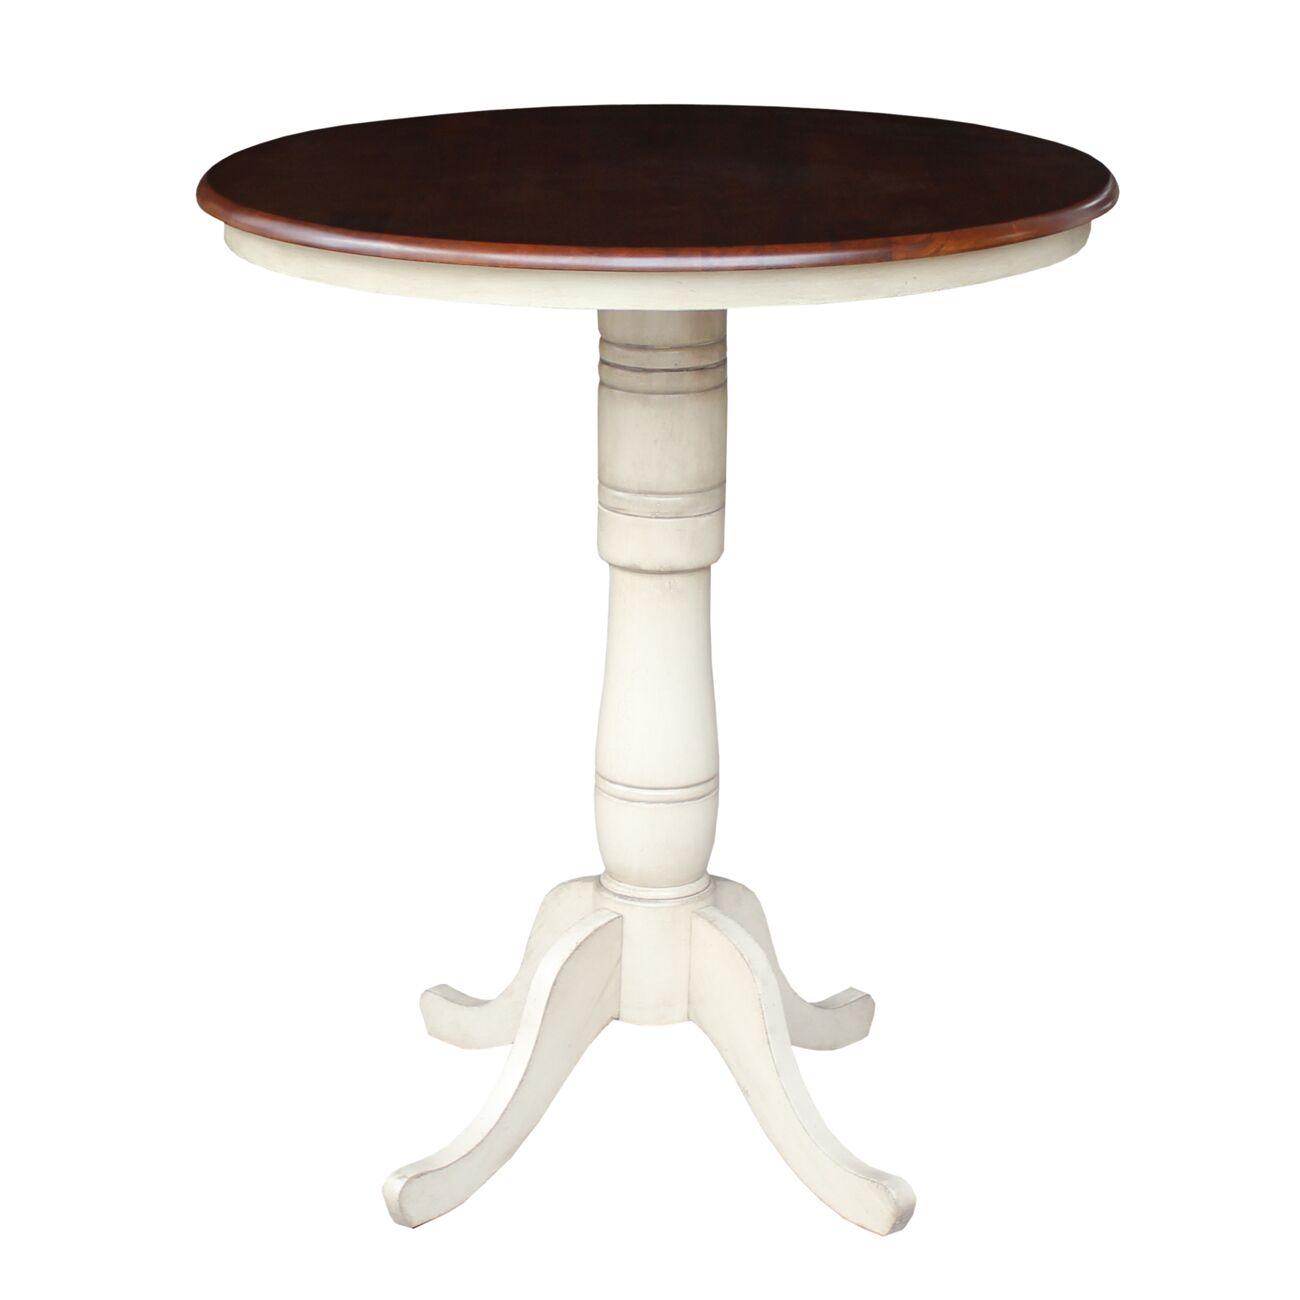 Bernadette Pub Table Tabletop Size: 42